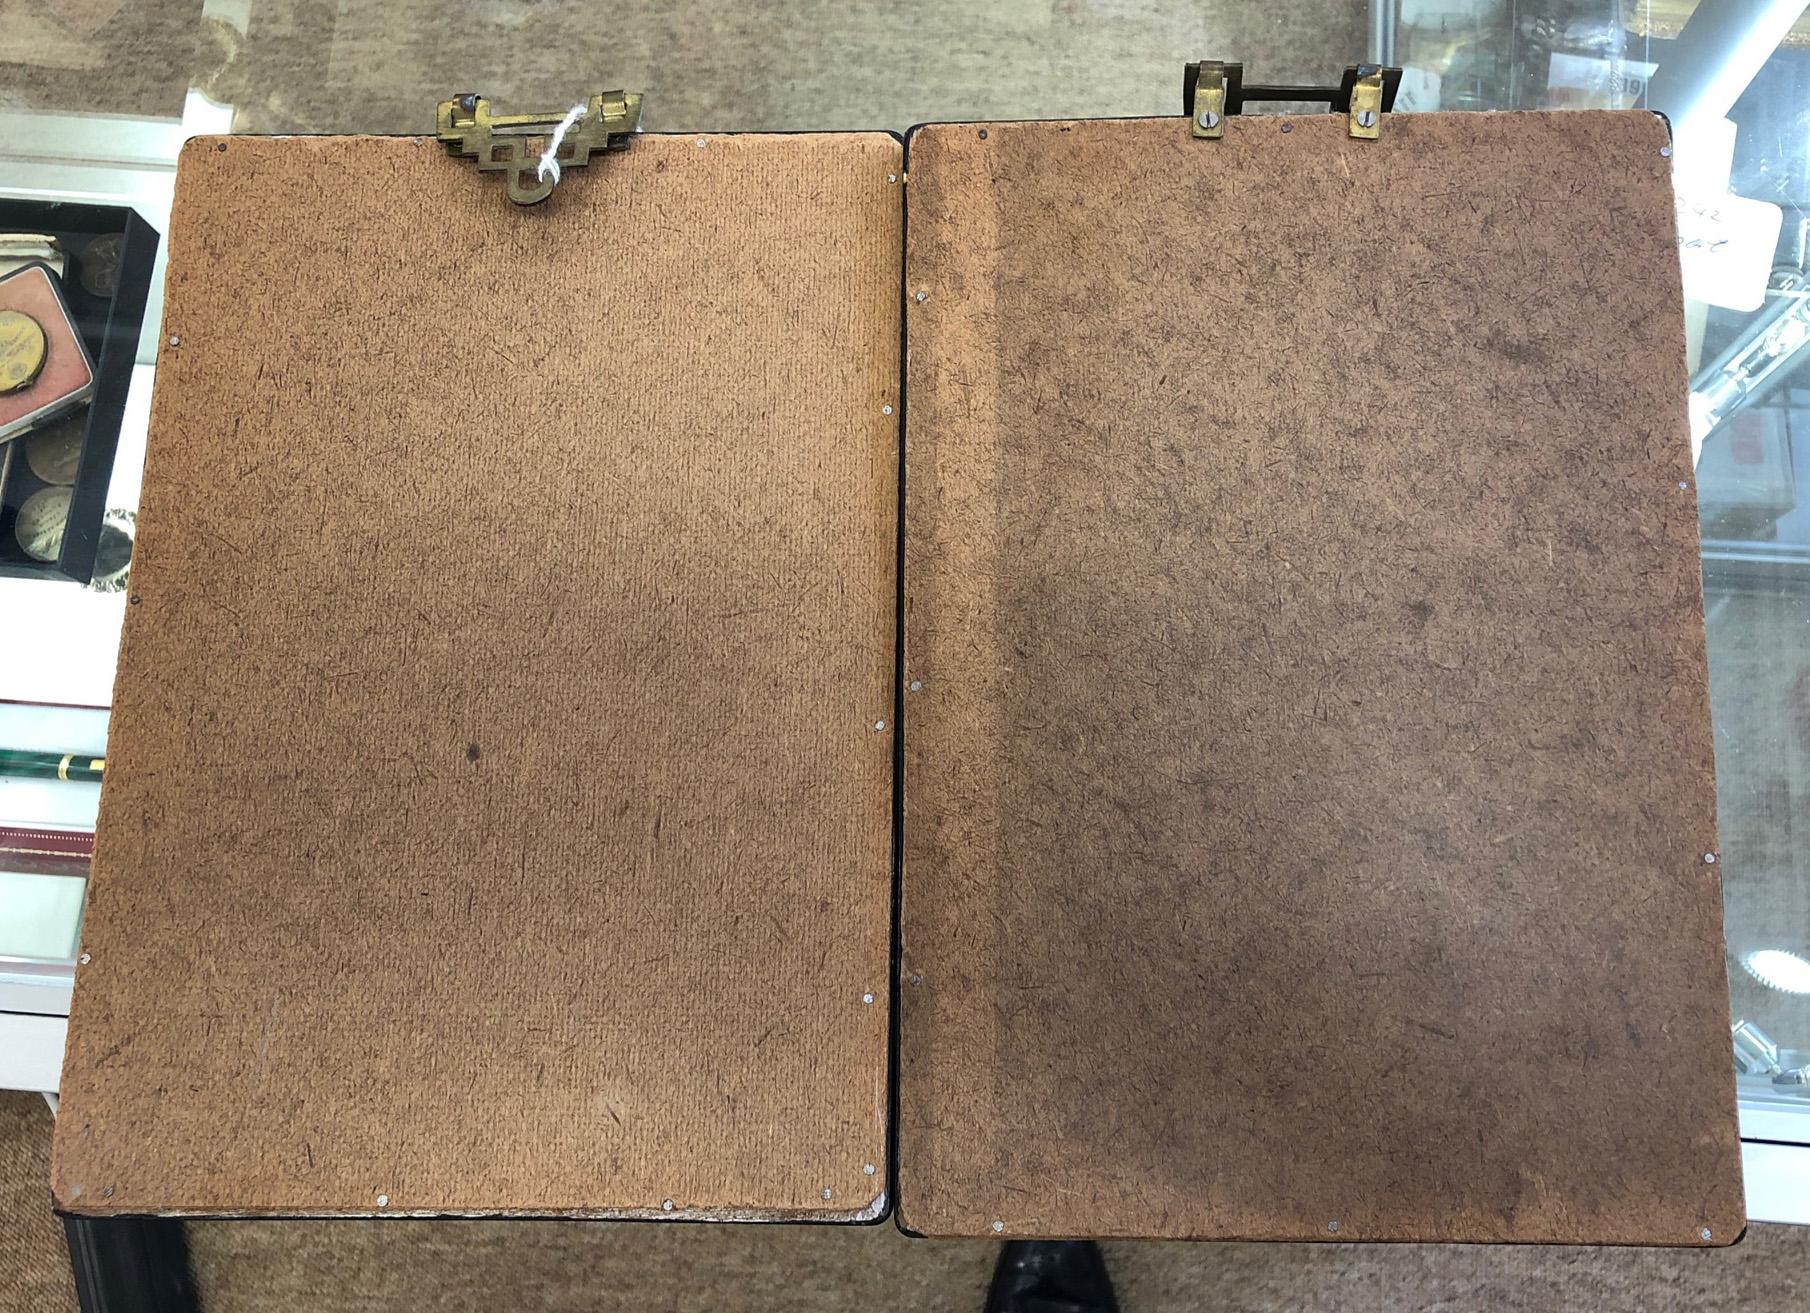 Lot 242 - A pair of Chinese rectangular ceramic plaques,